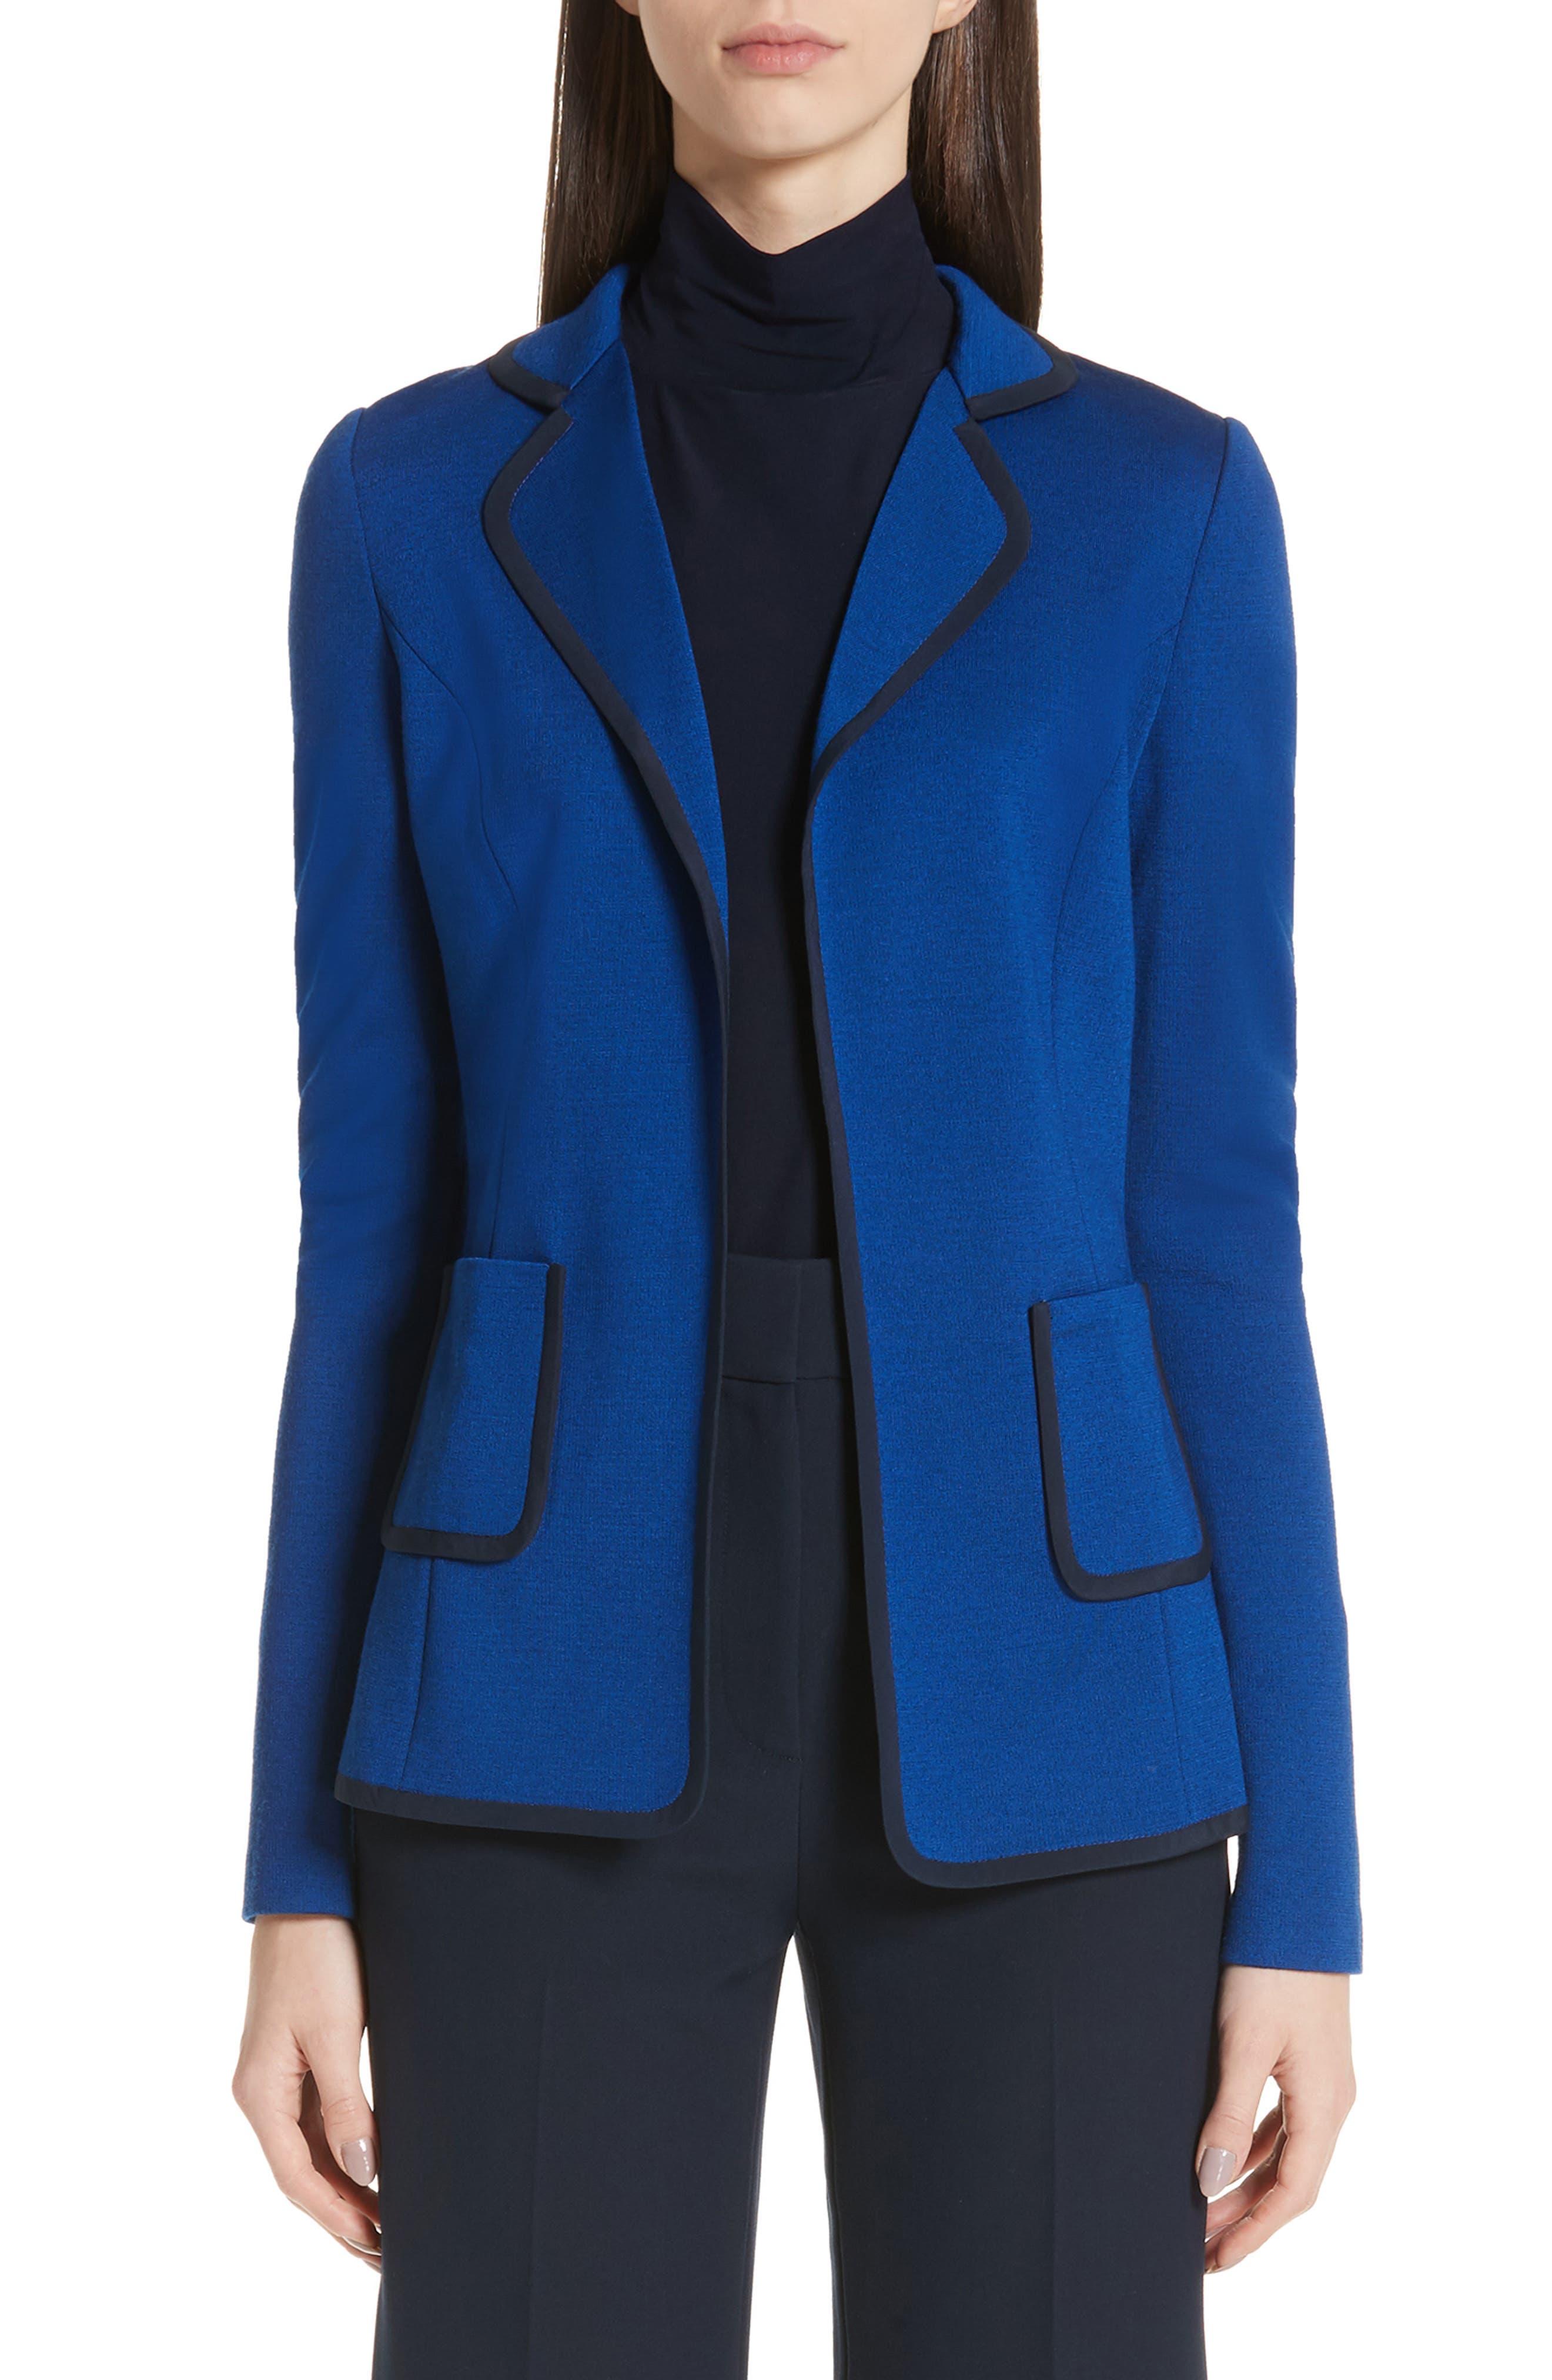 ST. JOHN COLLECTION Patch Pocket Milano Knit Jacket, Main, color, AZUL/ NAVY